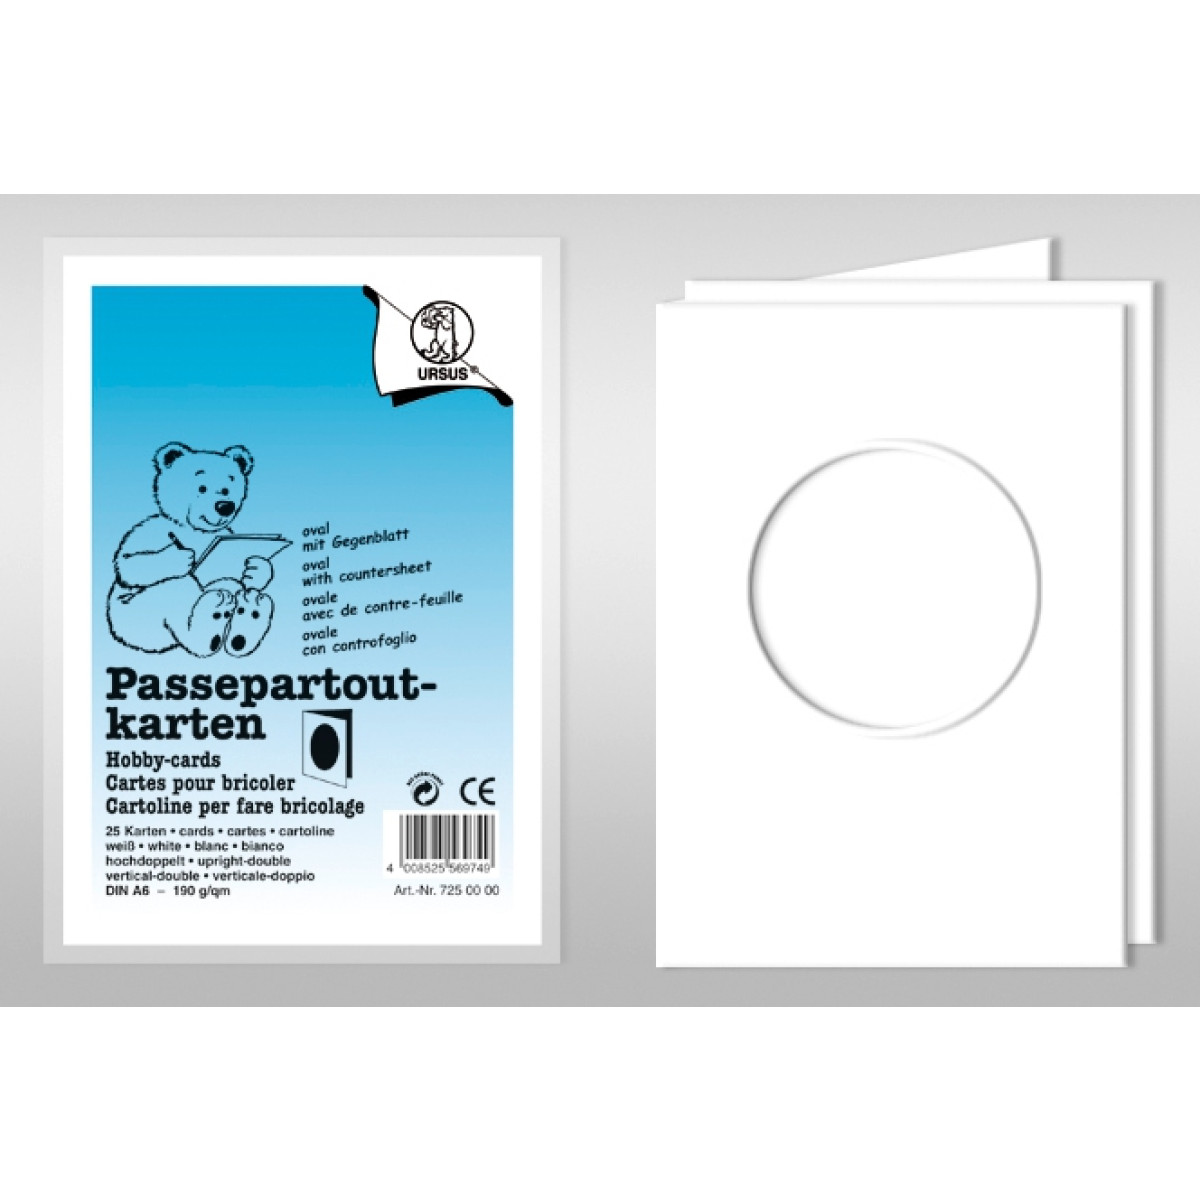 Passepartoutkarten rund DIN A6 hochdoppelt - 10 Stück